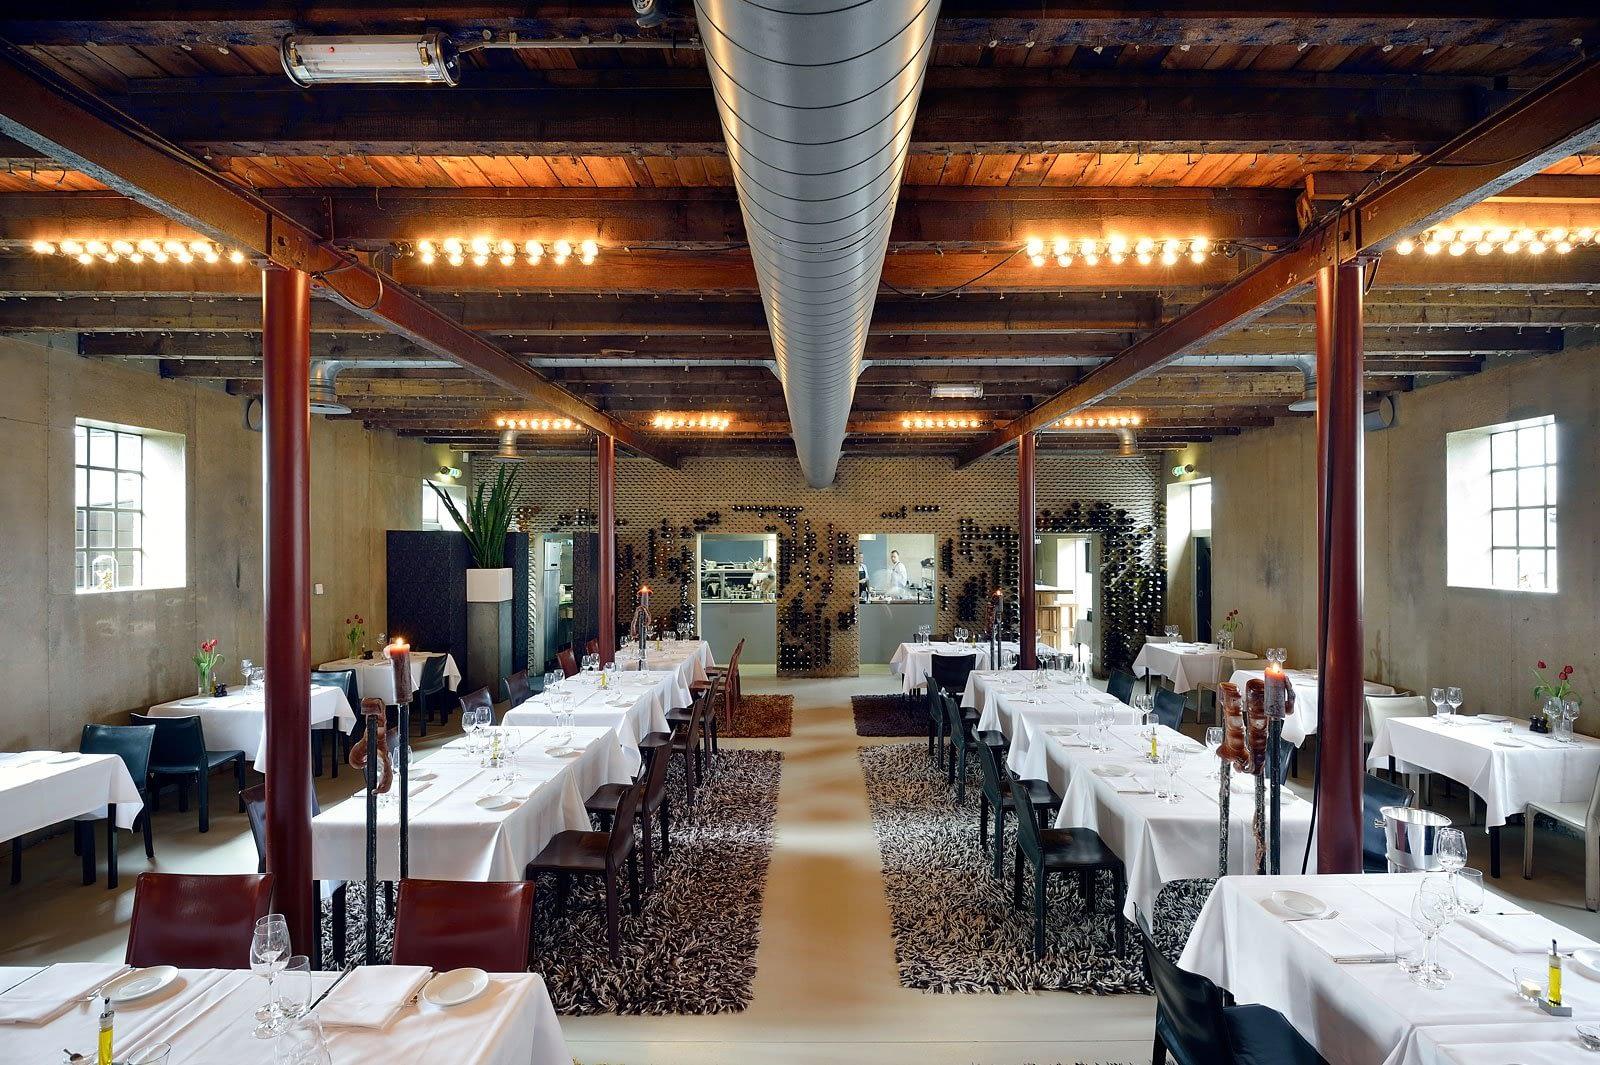 Gietvloer Restaurant Lute  Ouderkerk aan de Amstel